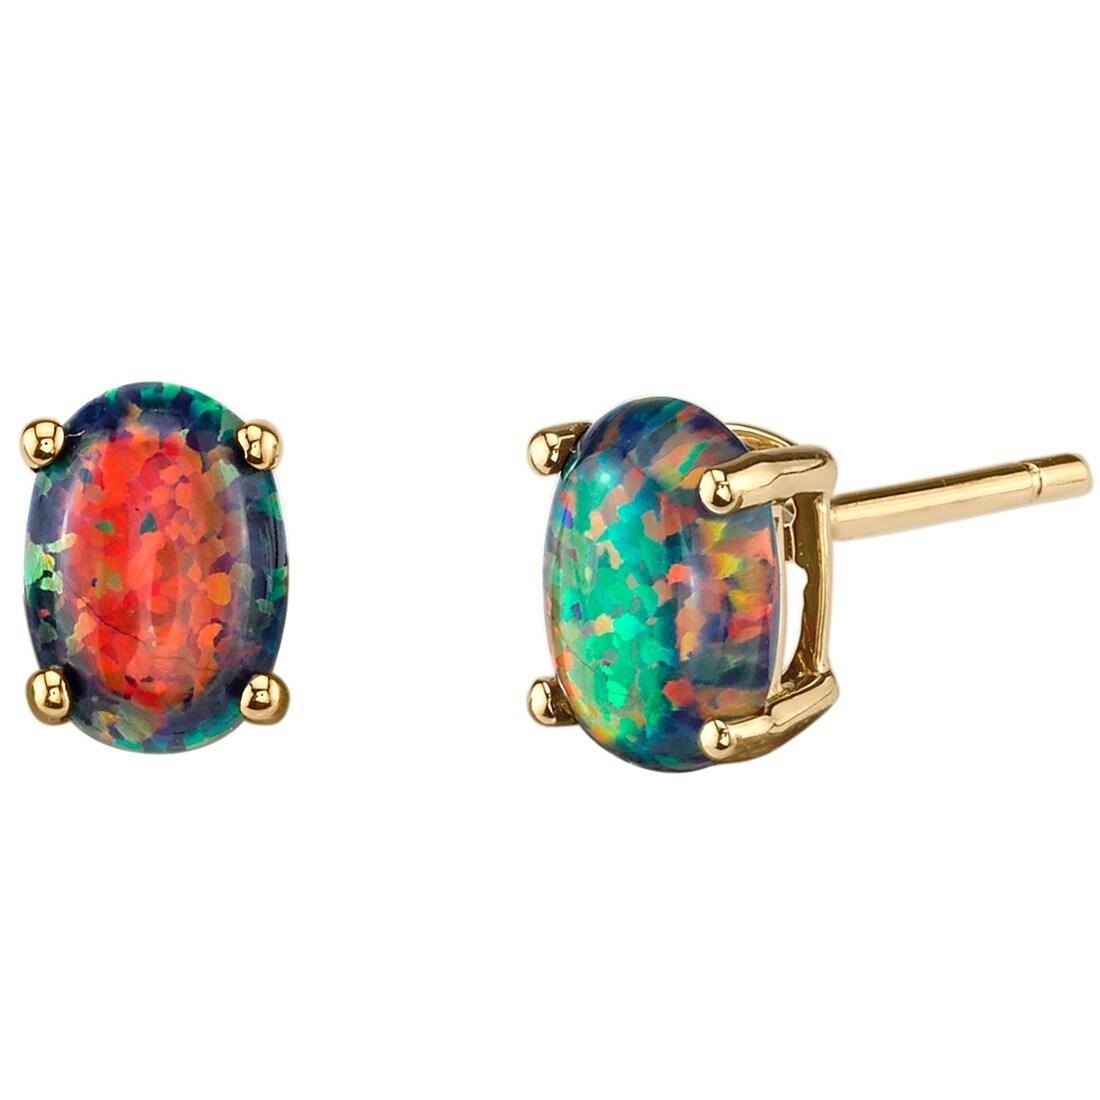 14k Oravo Yellow Gold Oval Shape Created Black Opal Stud Earrings